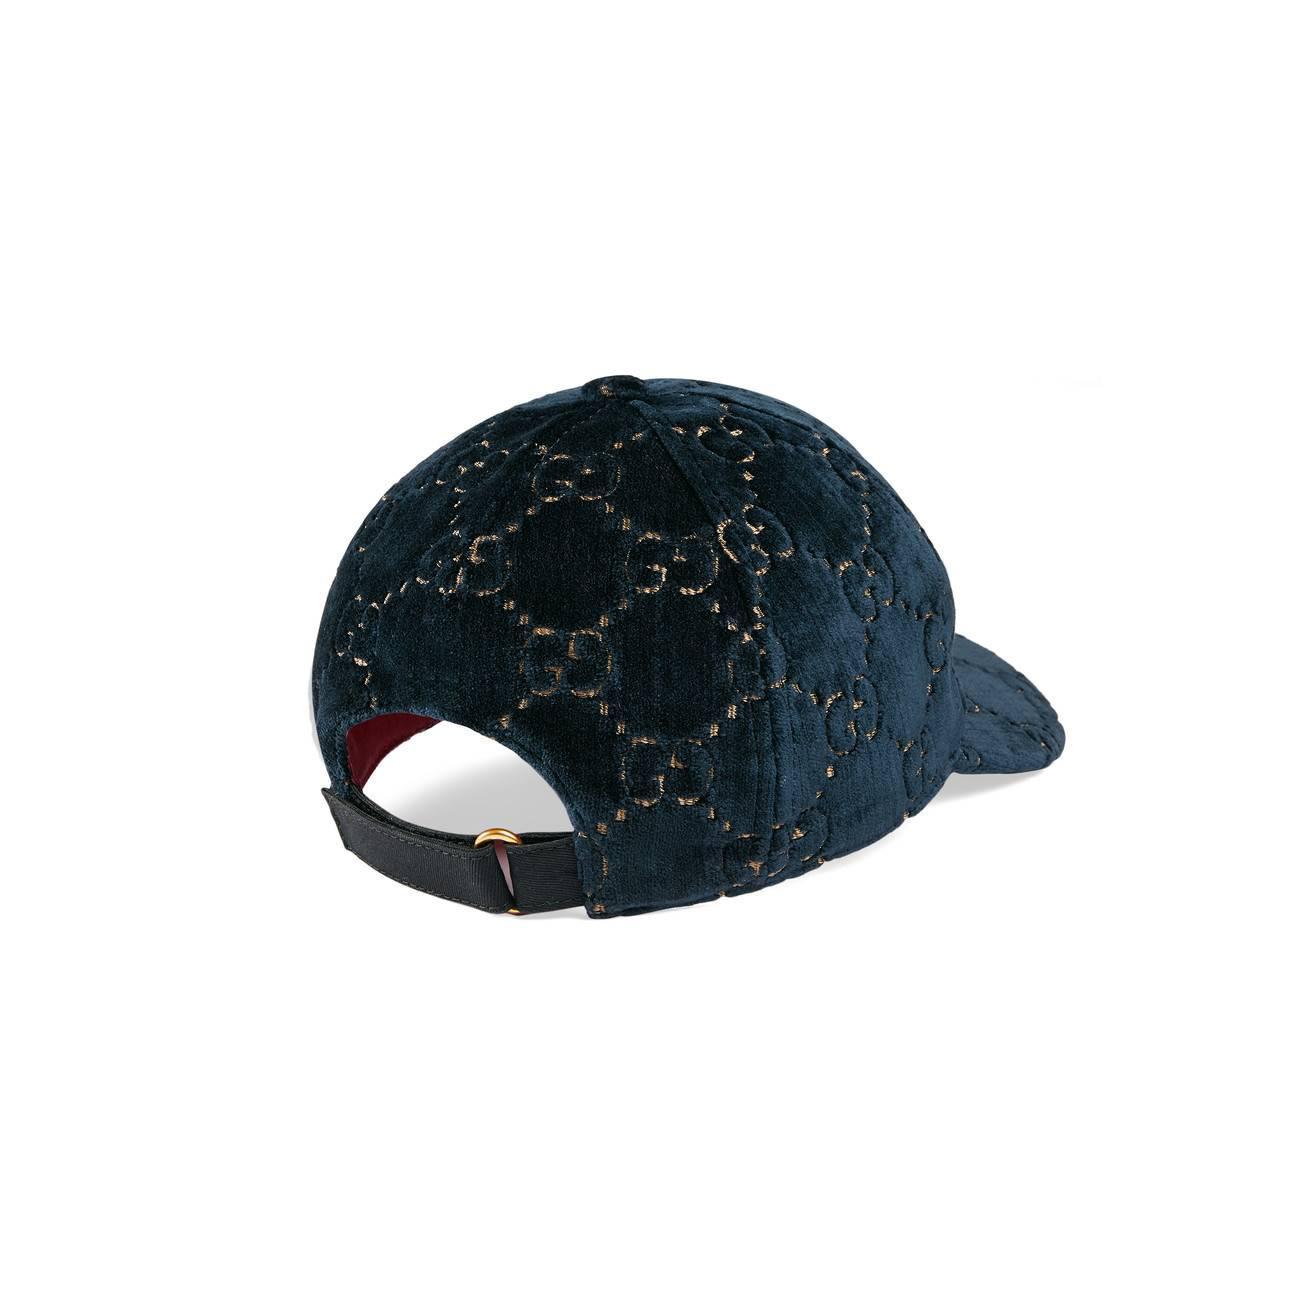 Gucci - Blue GG Velvet Baseball Cap - Lyst. View fullscreen 1e5d90c7efd0